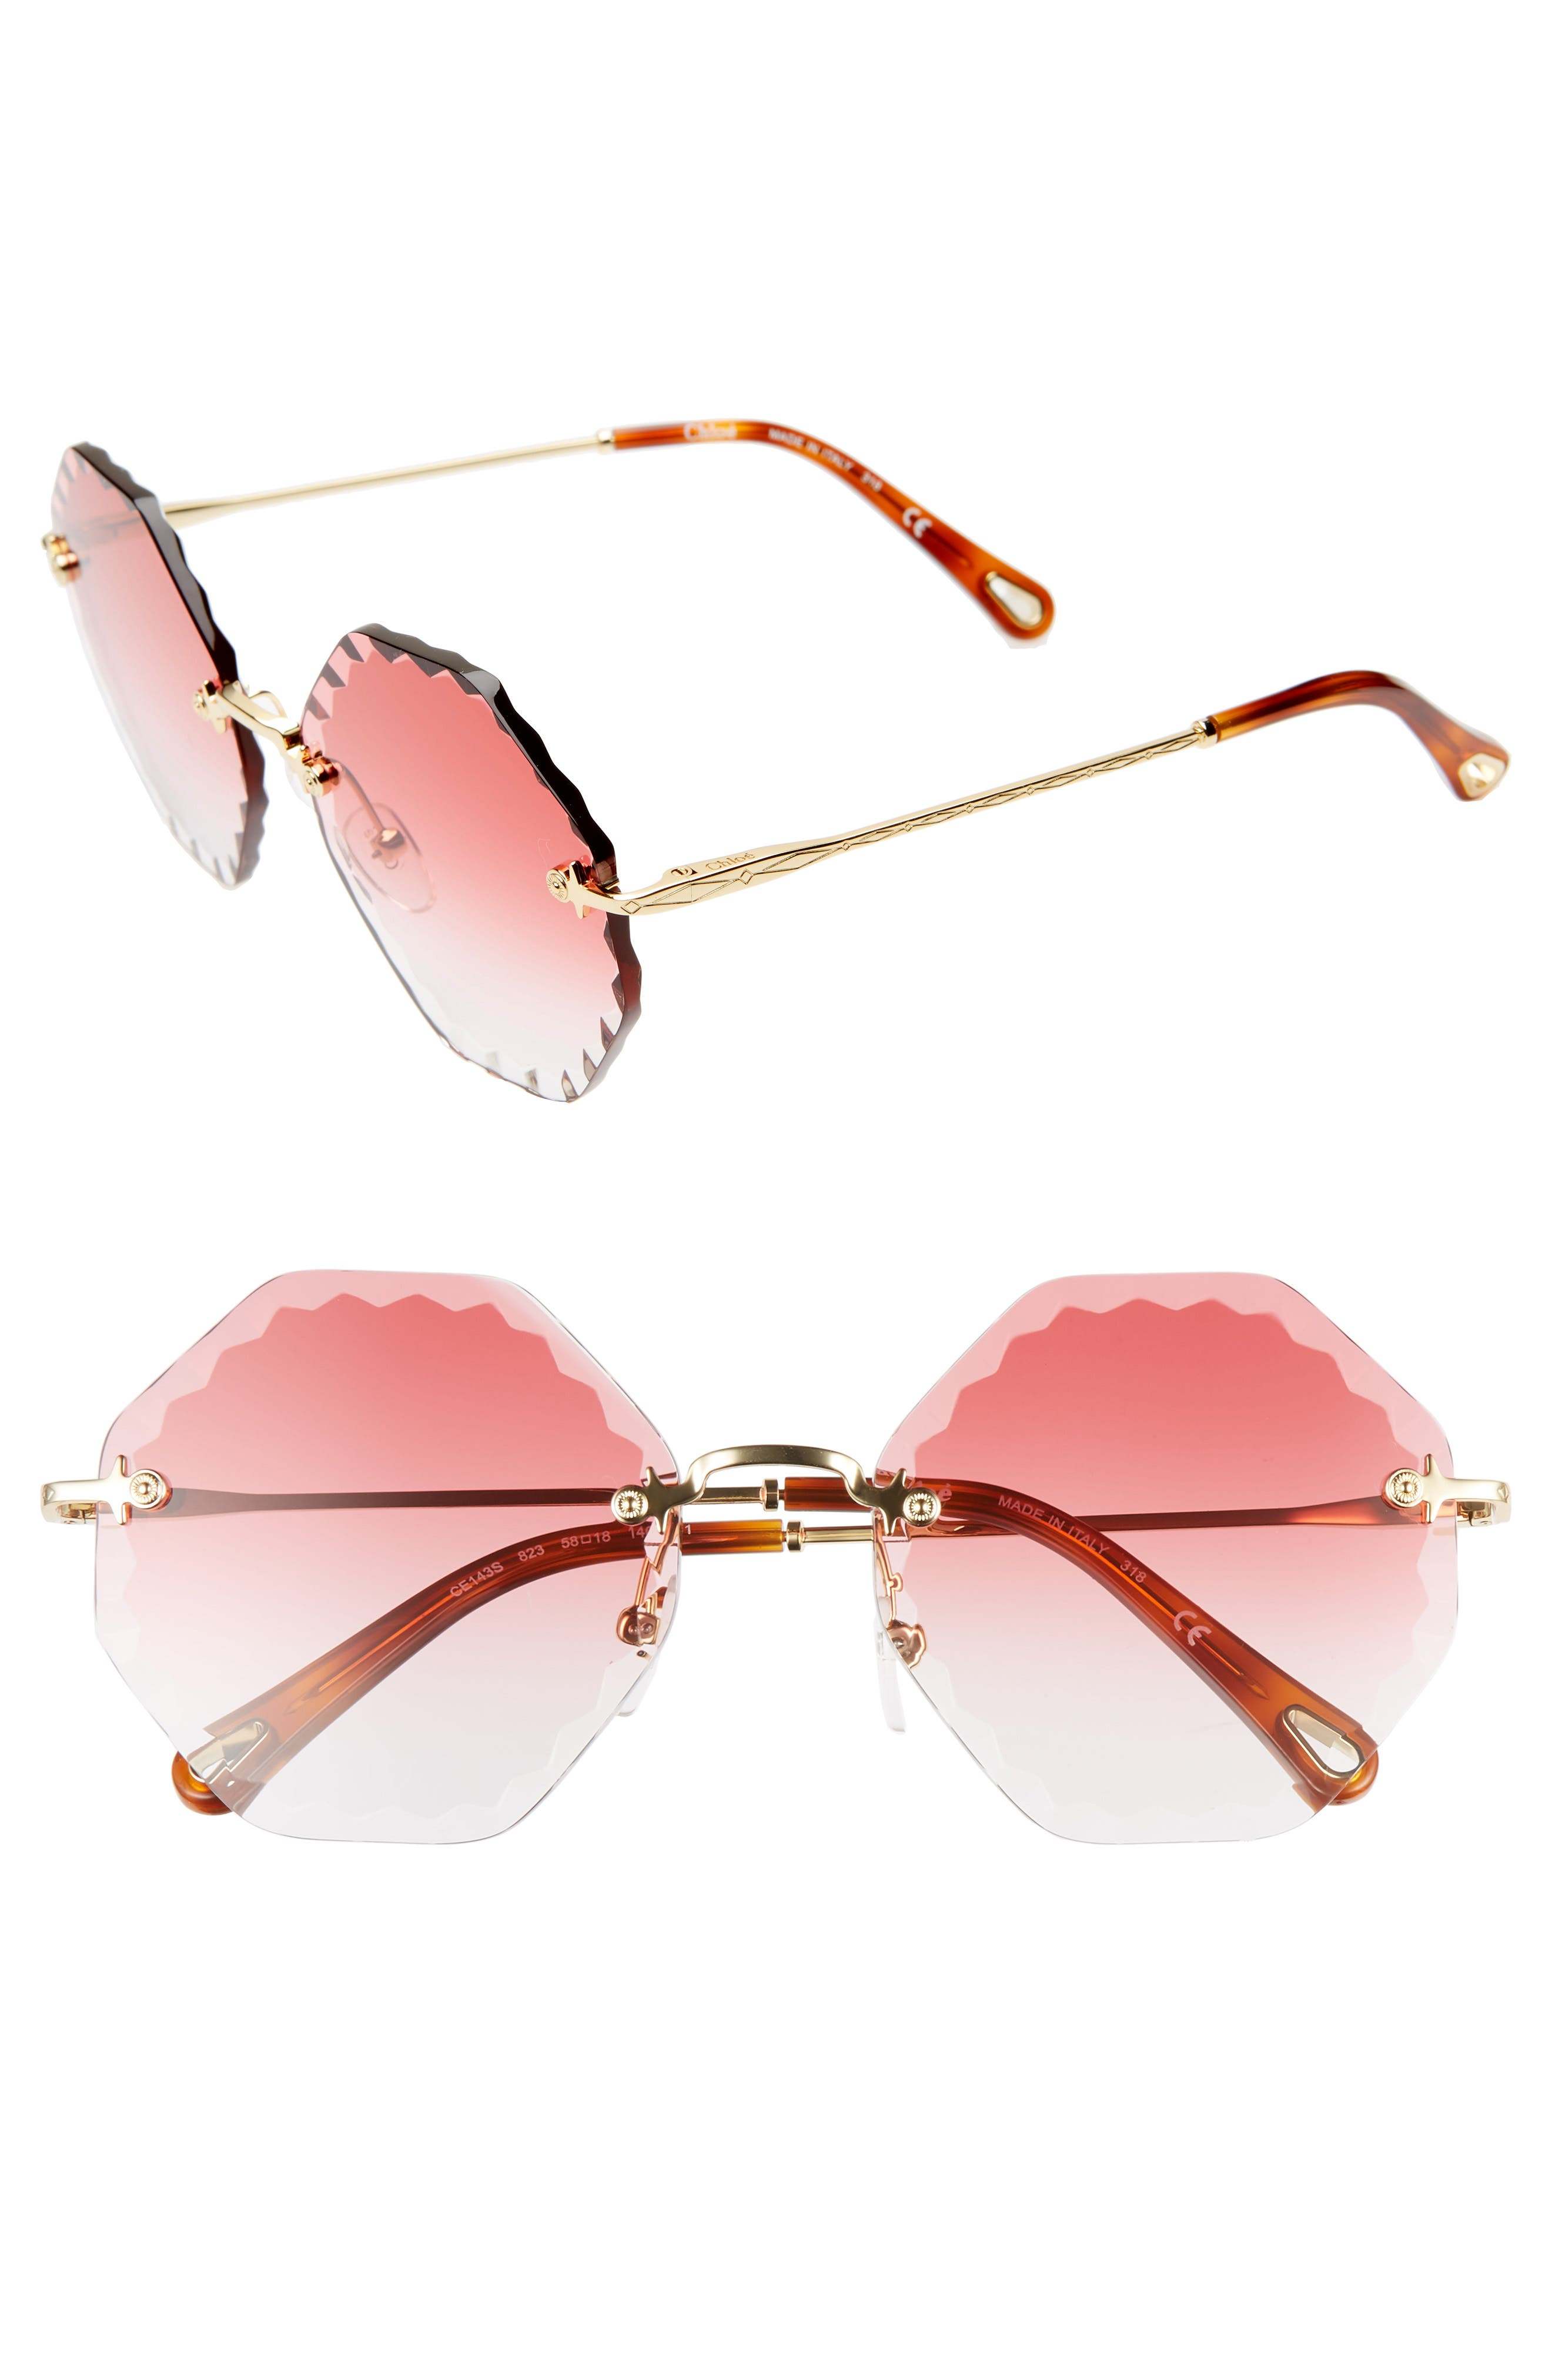 Chloe Rosie 5m Gradient Octagonal Rimless Sunglasses - Gold/ Gradient Coral